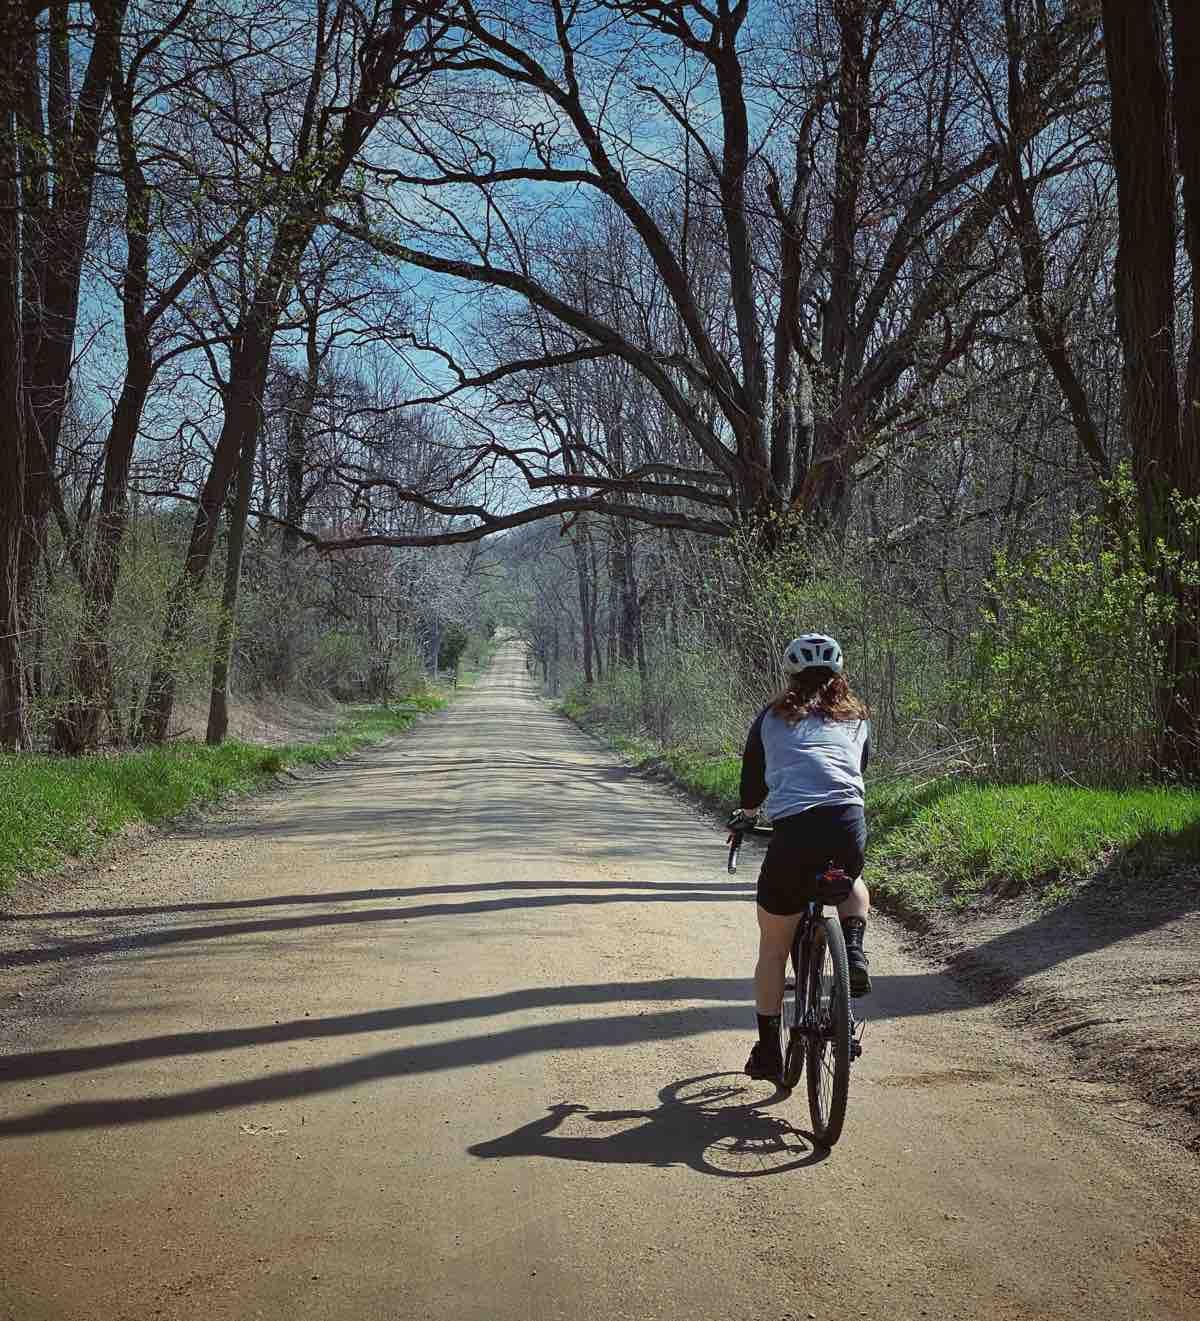 Bikerumor Pic Of The Day: Holly, Michigan